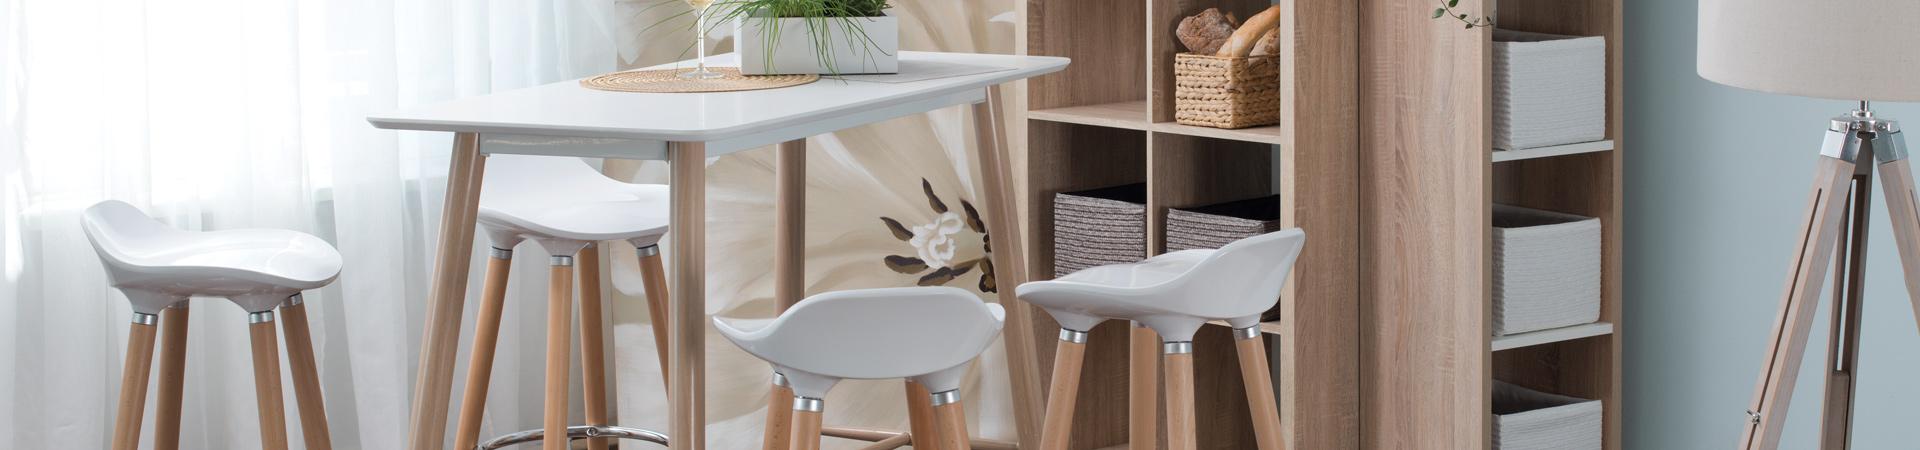 Lauad, 4 tooliga